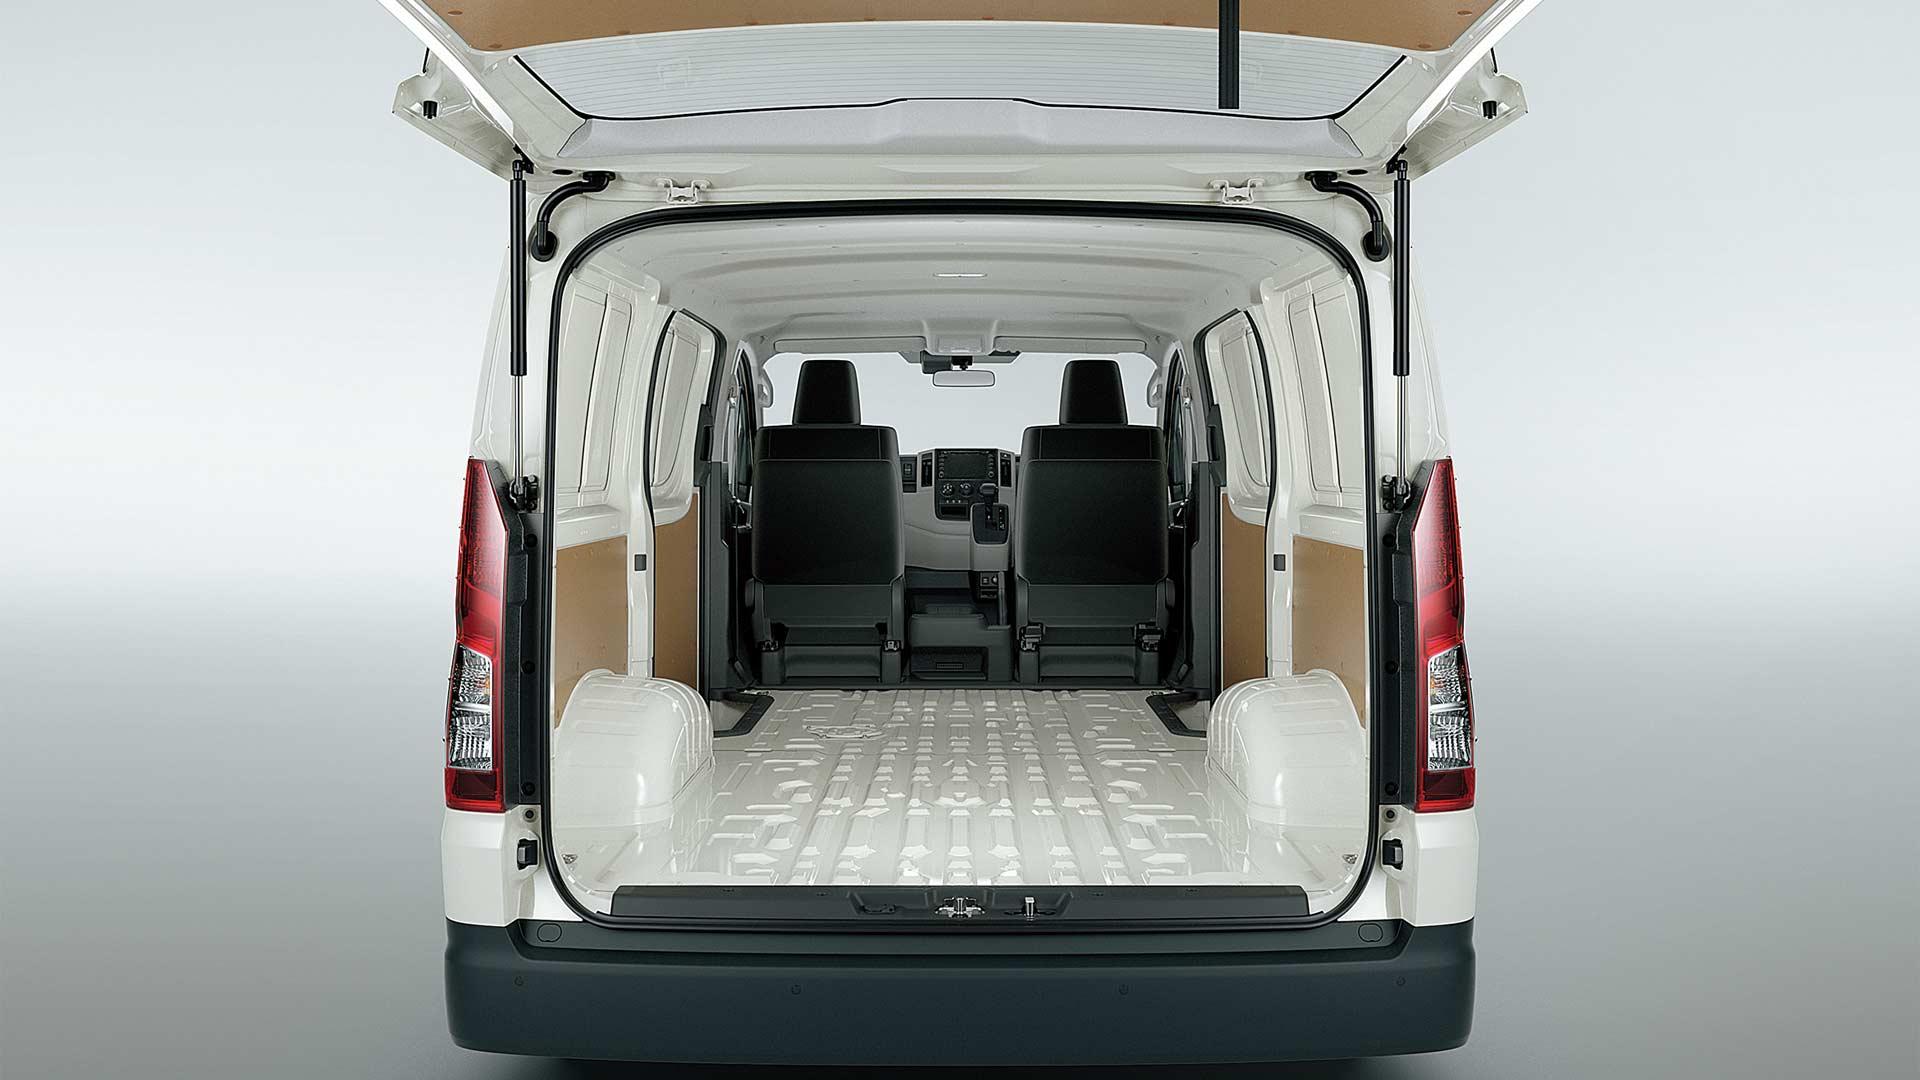 2019-6th-generation-Toyota-Hiace-cargo-Interior